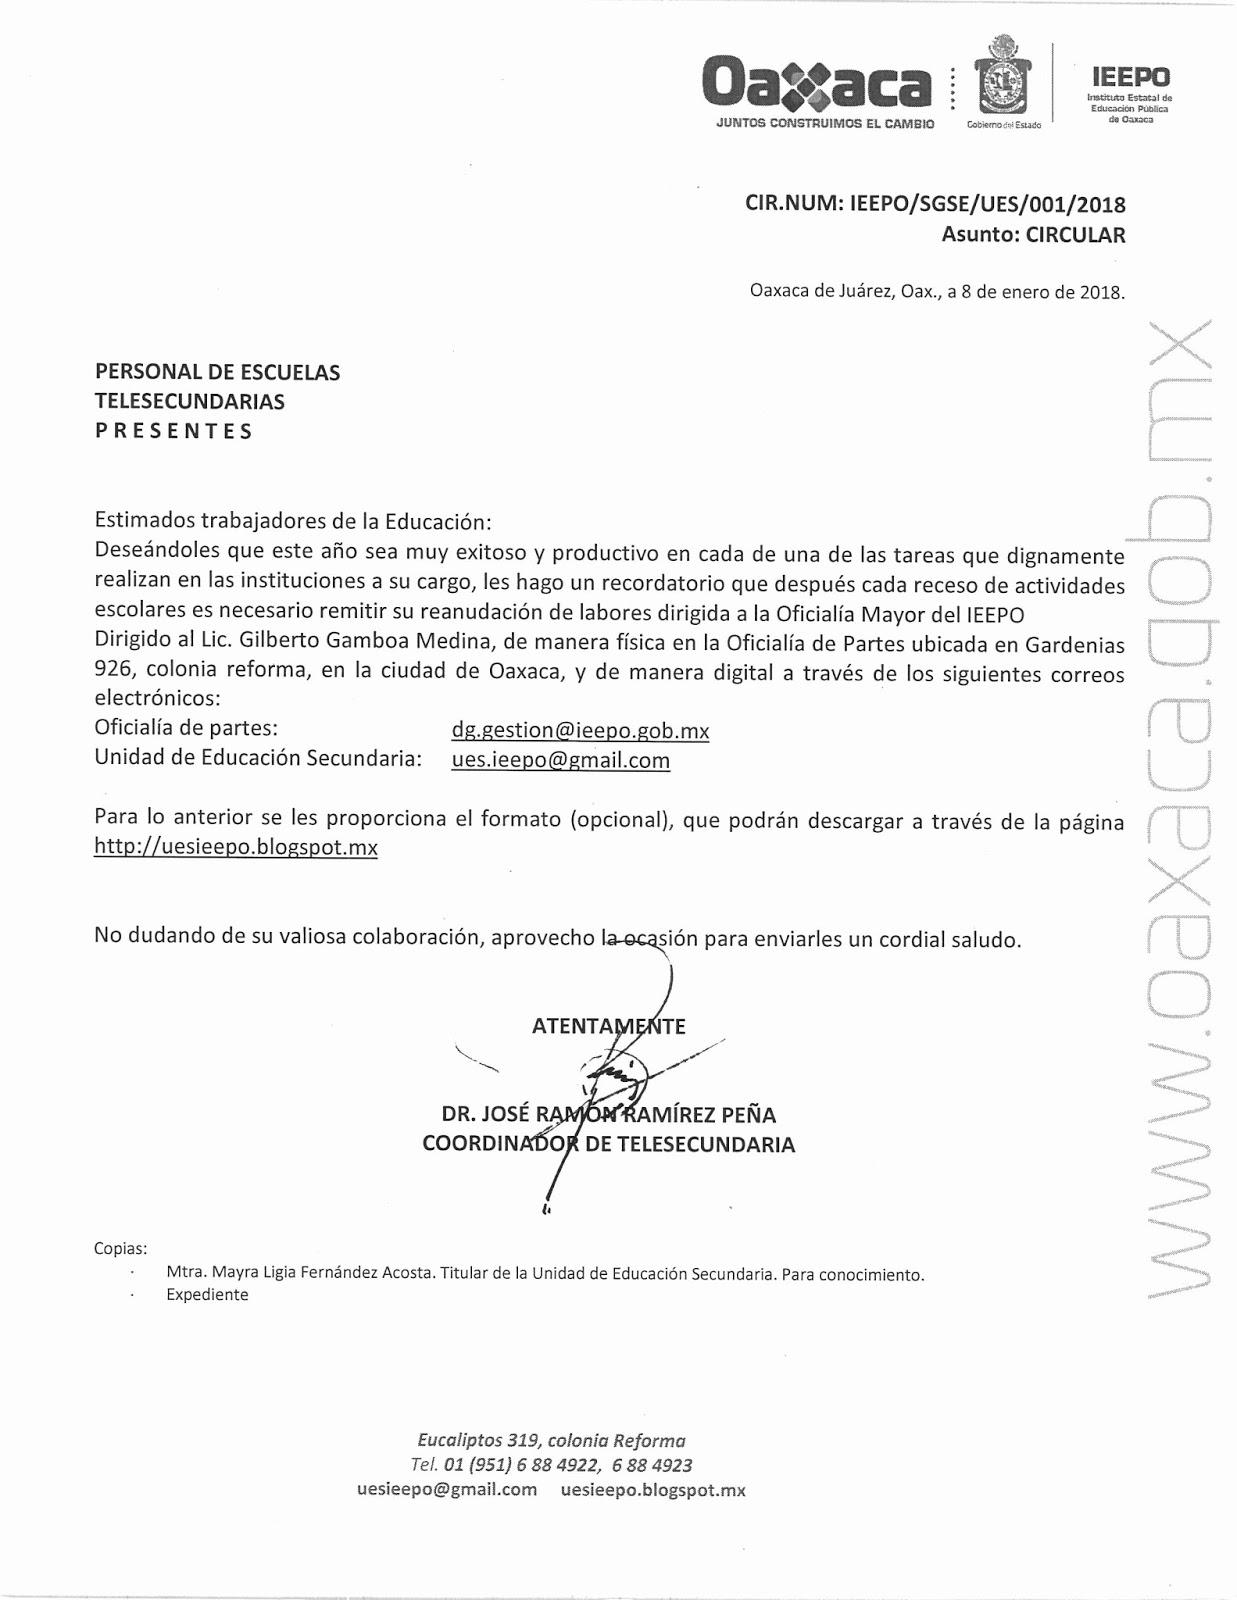 Perfecto Reanudar El Coordinador Administrativo Viñeta - Ejemplo De ...